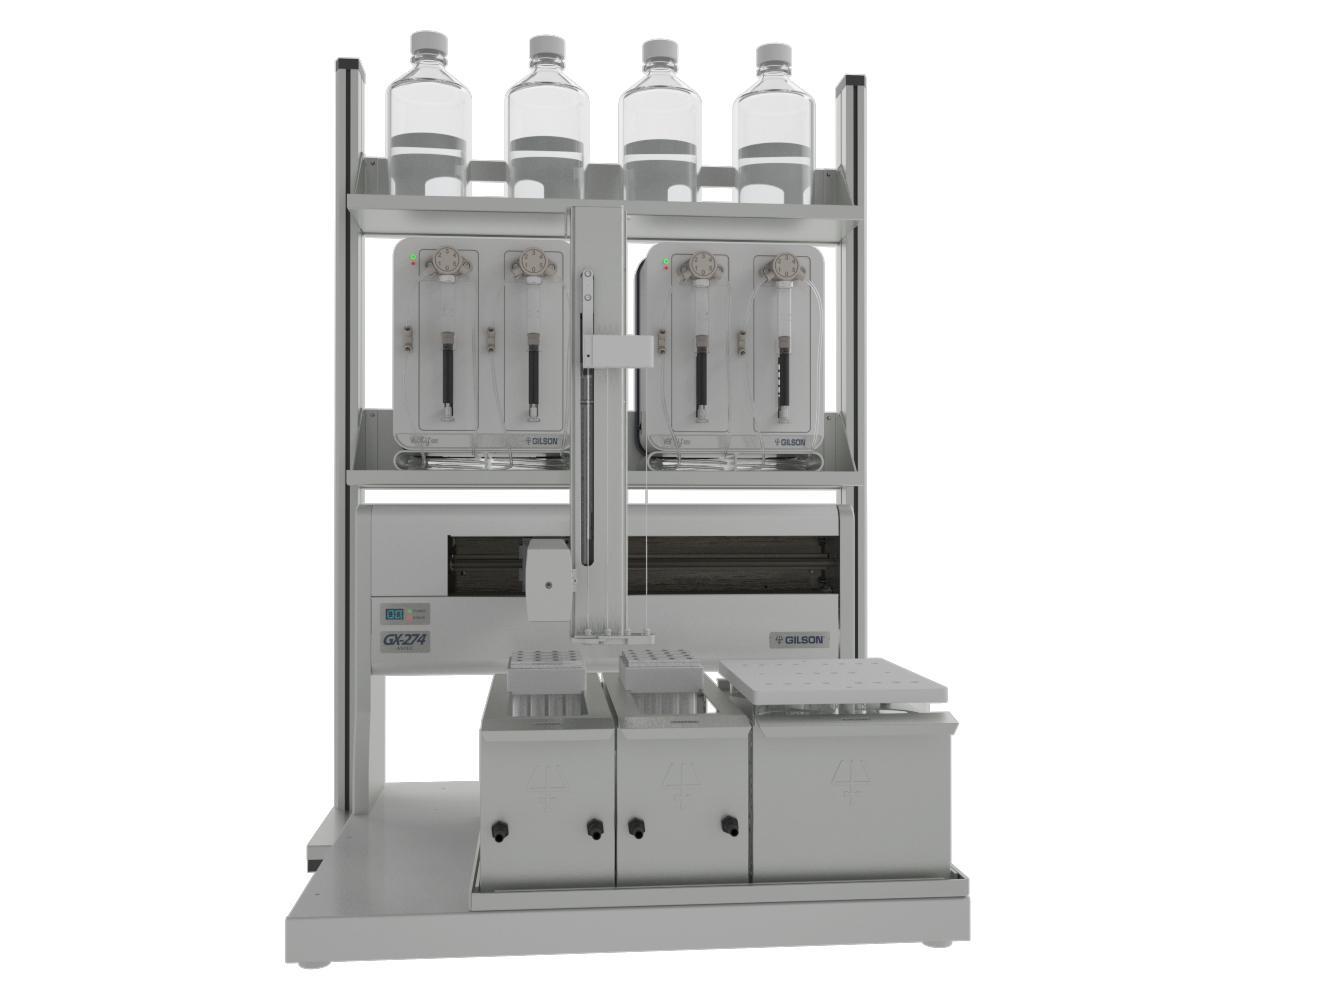 2614010_MAIN_GX-274-ASPEC-with-2-Dual-4260-Syringe-Pumps.jpg